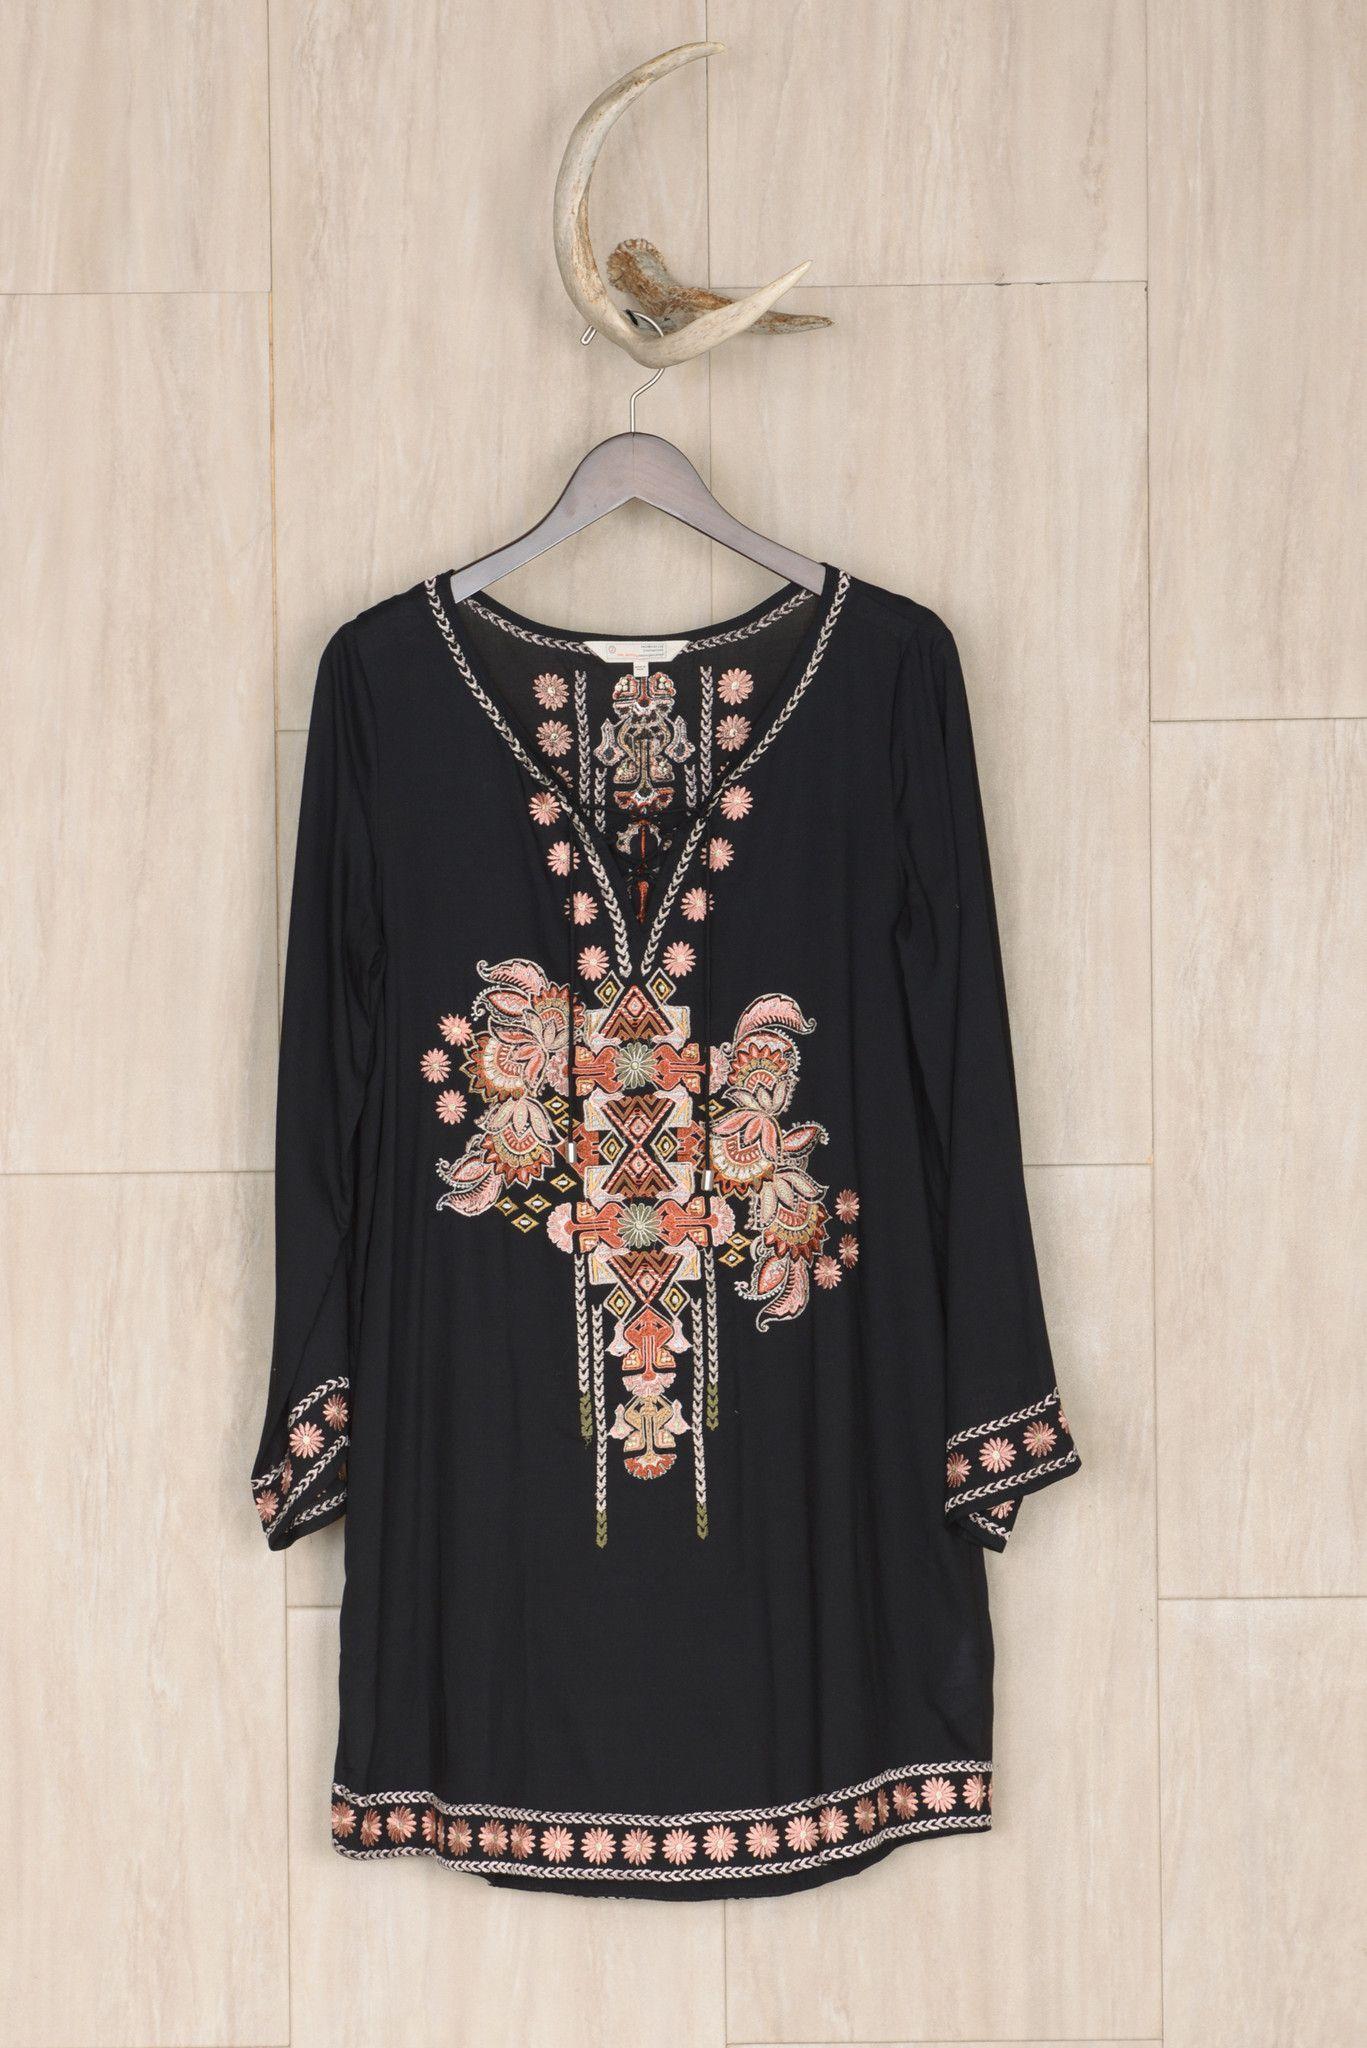 3edd9c559b7aaa2206032f78d33542c0 - Odd Molly The Gardener Long Dress